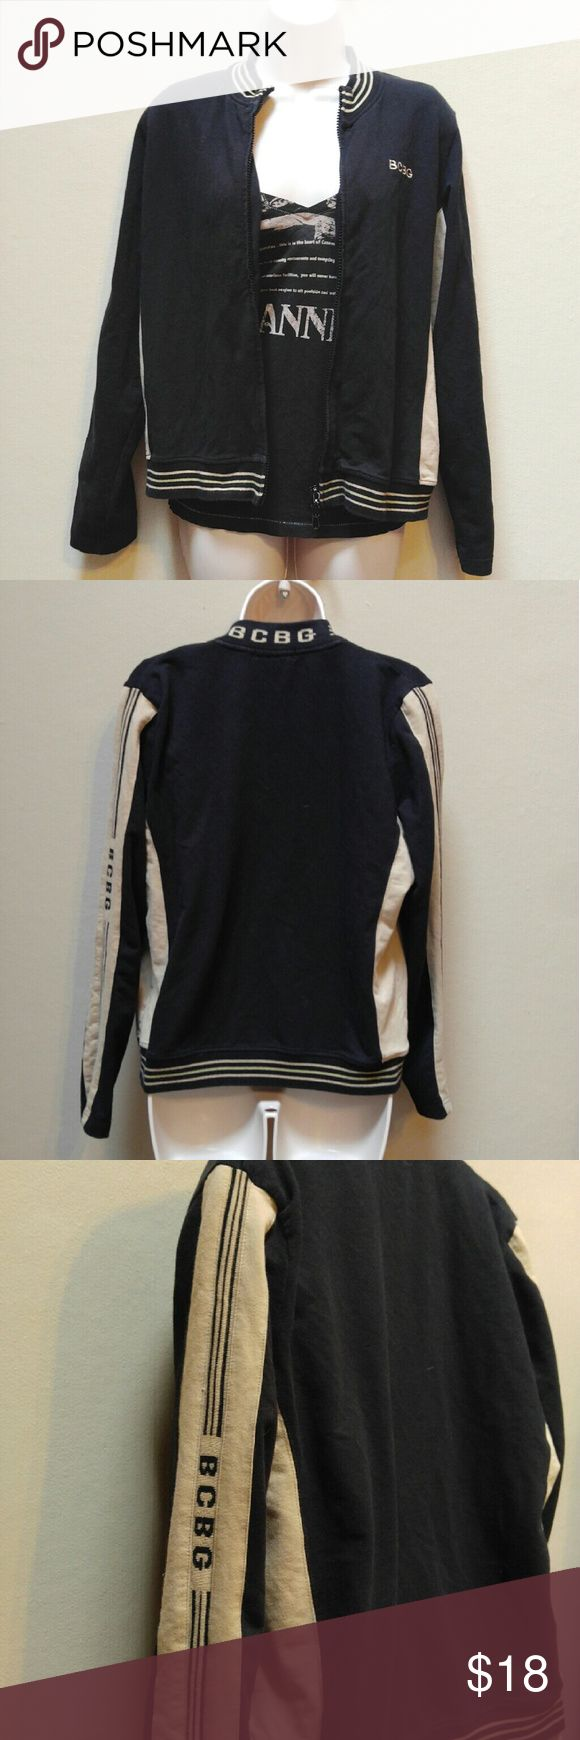 BCBGMaxazria jacket Super cute for Fall.  Brown with tan trim.  BCBG down the left arm.  Good condition.  XL, but works better for L. BCBGMaxAzria Jackets & Coats